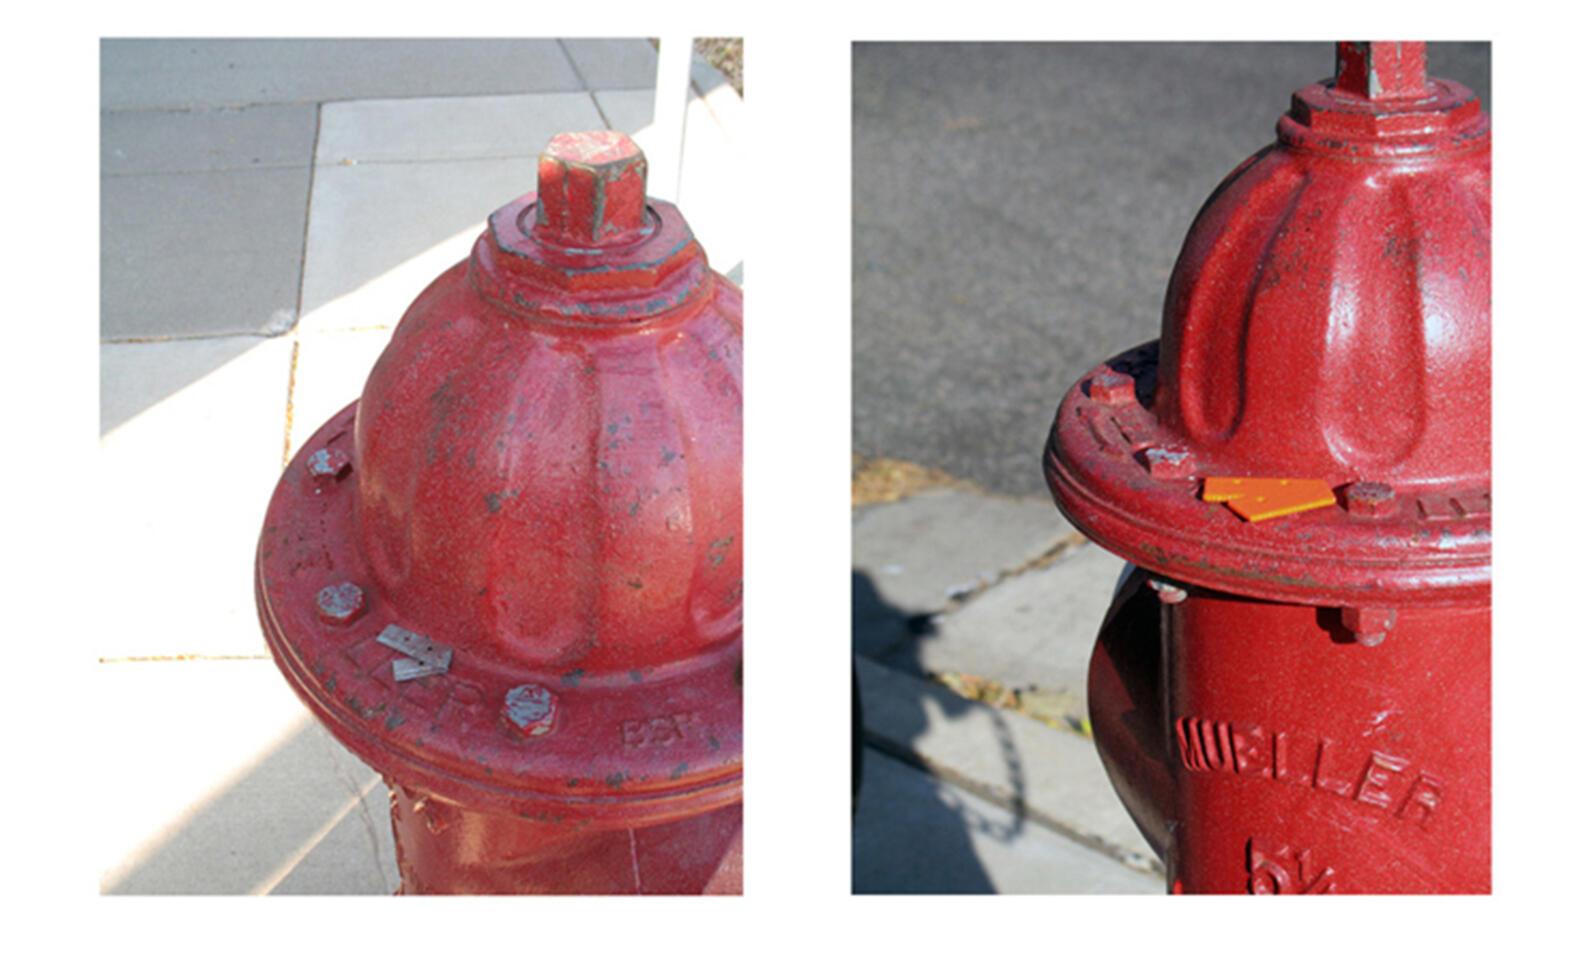 3D printed object on a fire hydrant ; Anna Kaiser